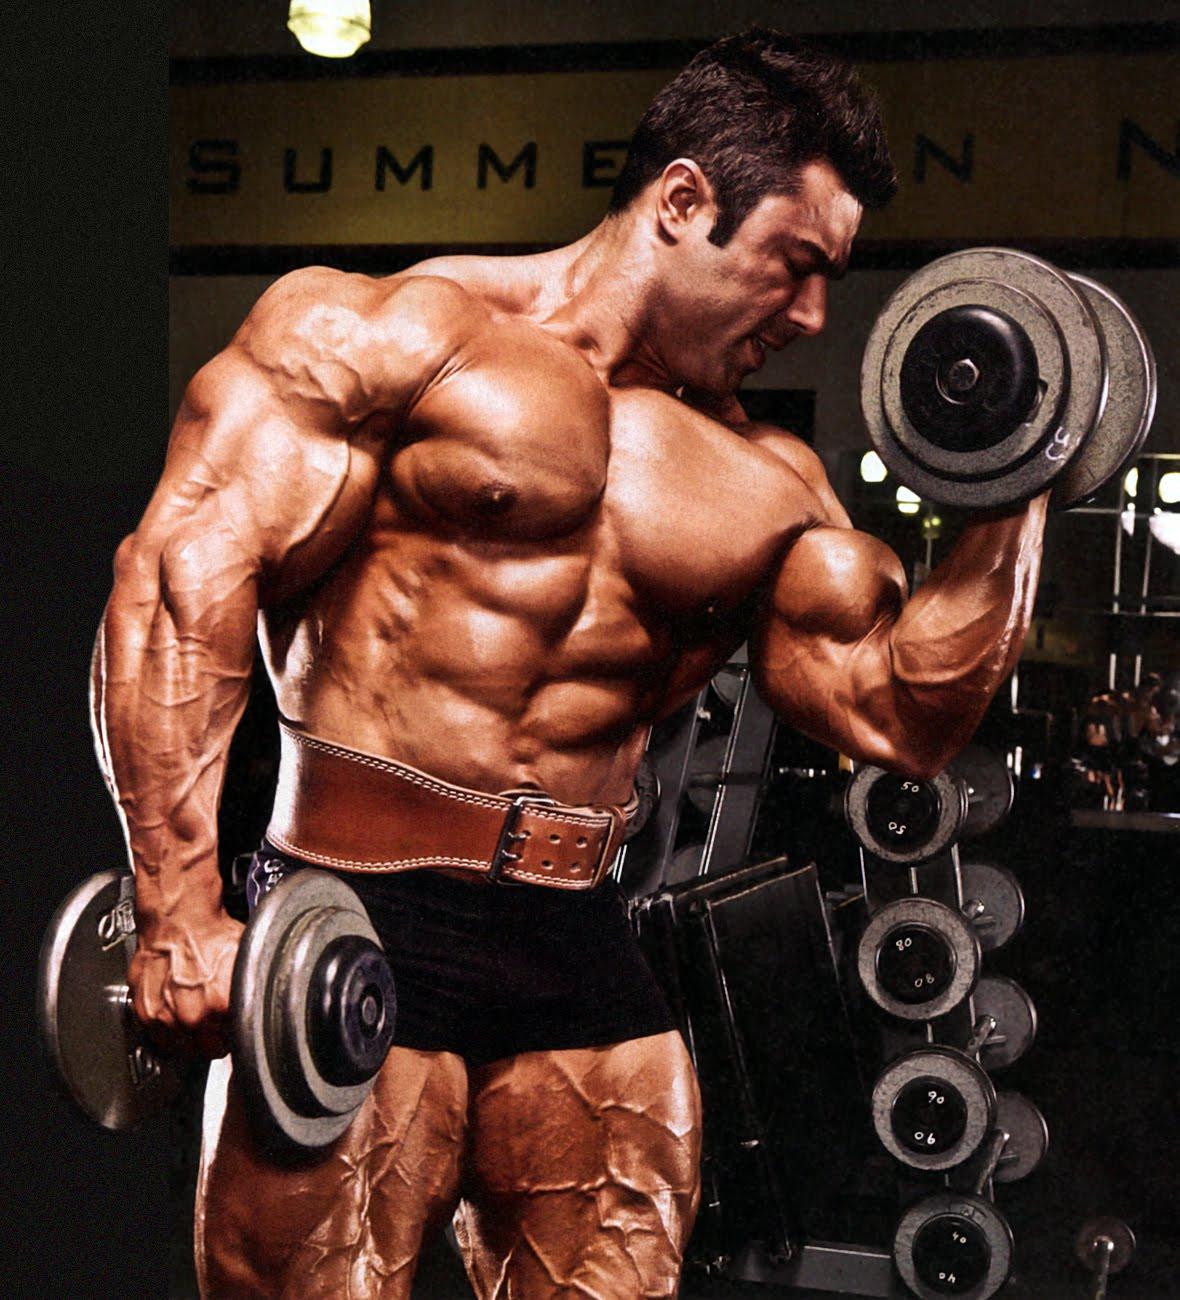 Almost Perfect: Eduardo Correa Works his Arms 2